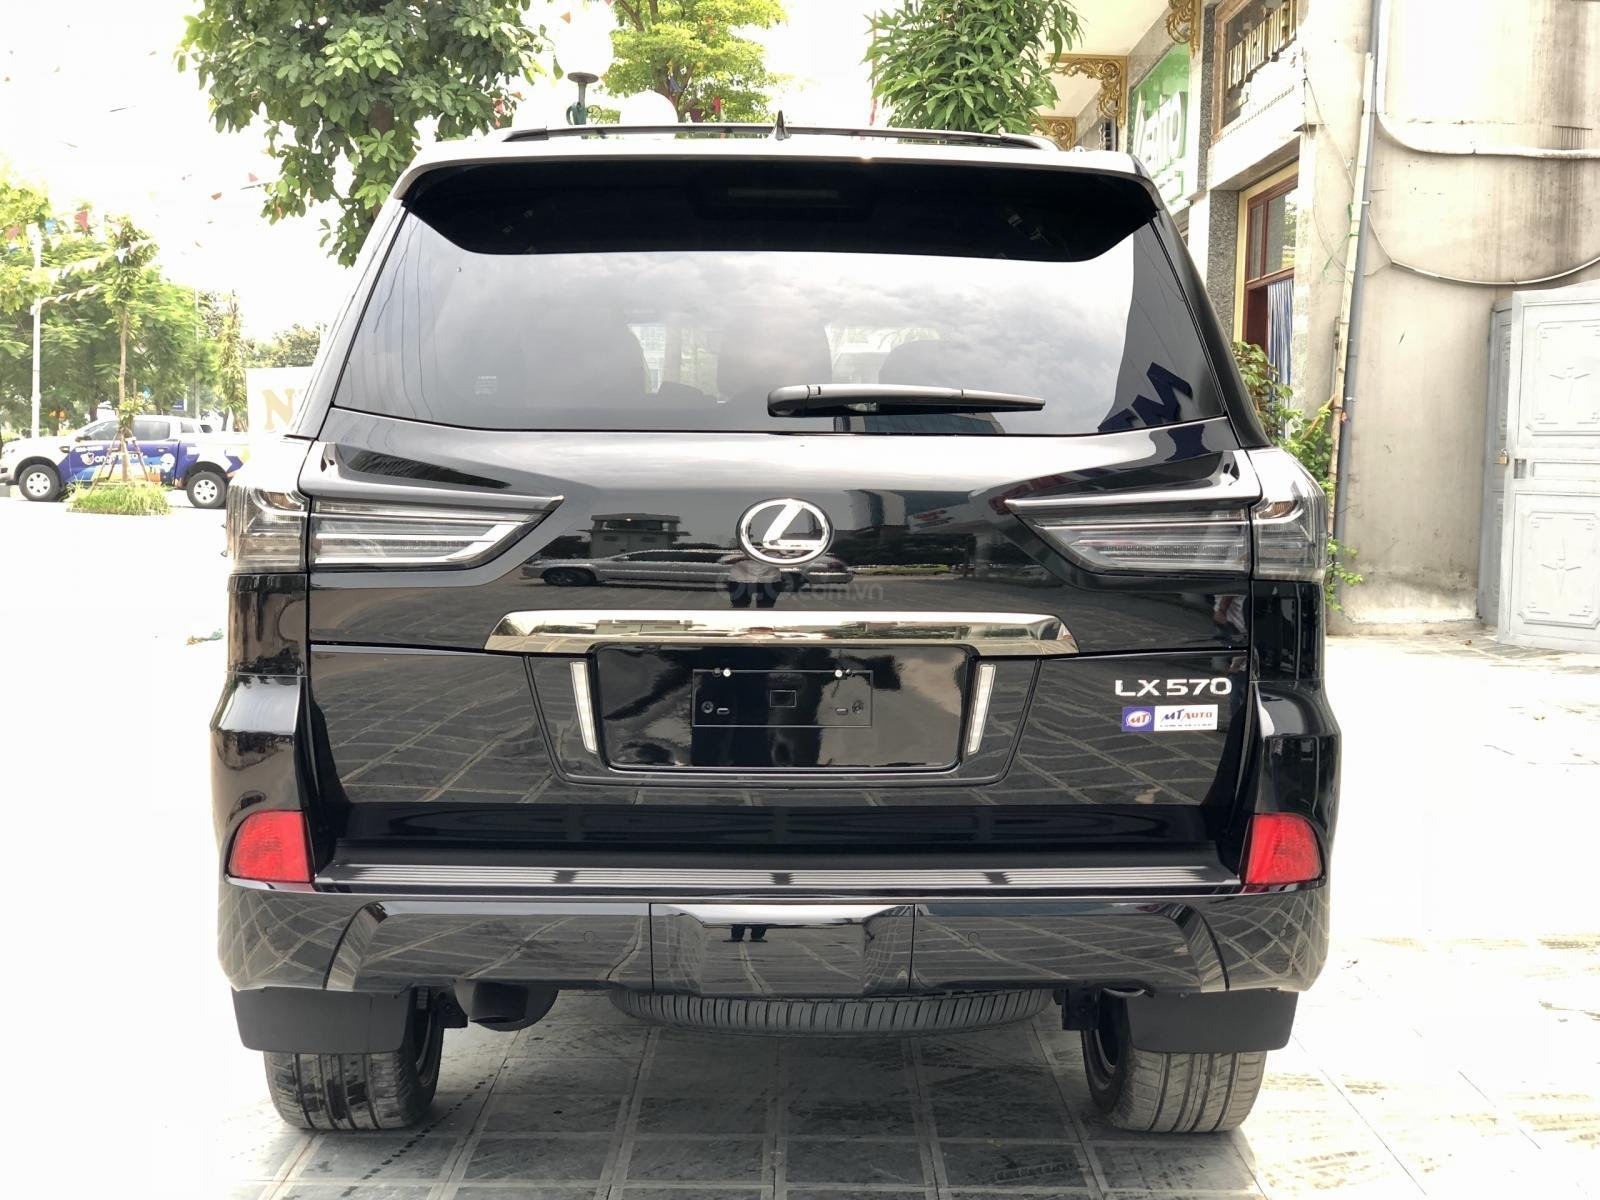 Bán Lexus LX 570 Inspiration Series 2019 bản giới hạn, LH 0945392468-7